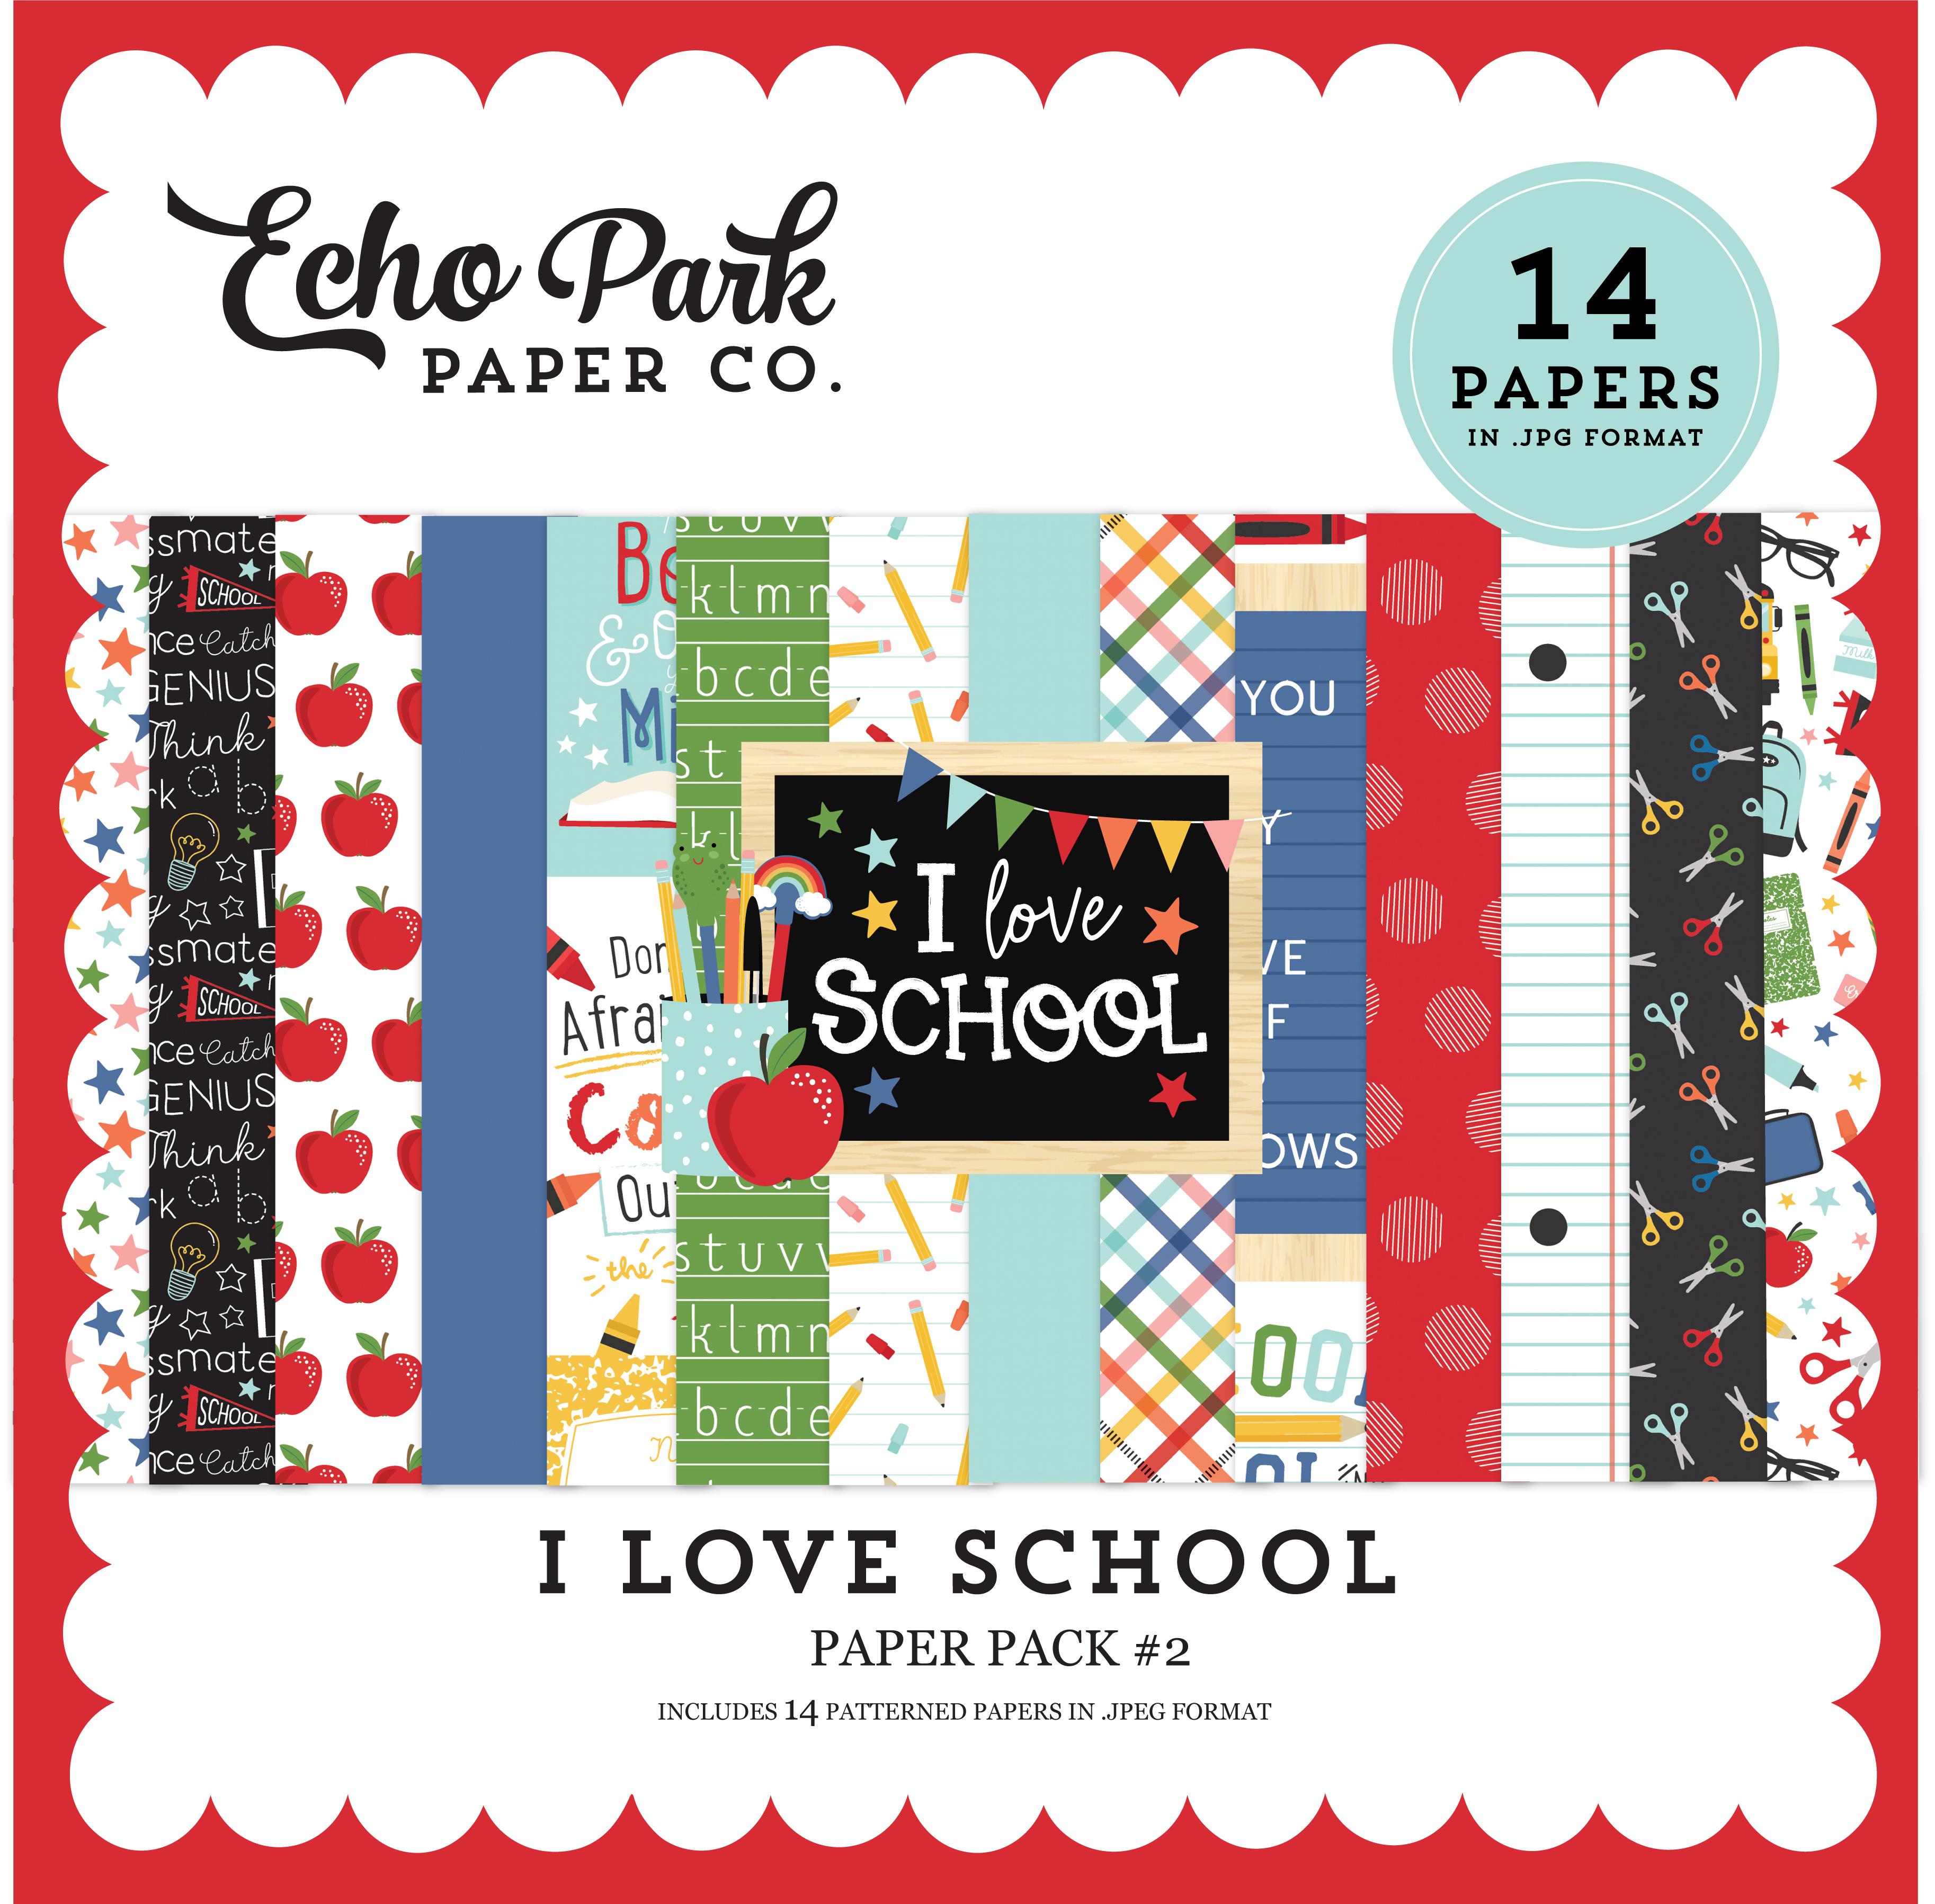 I Love School Paper Pack #2